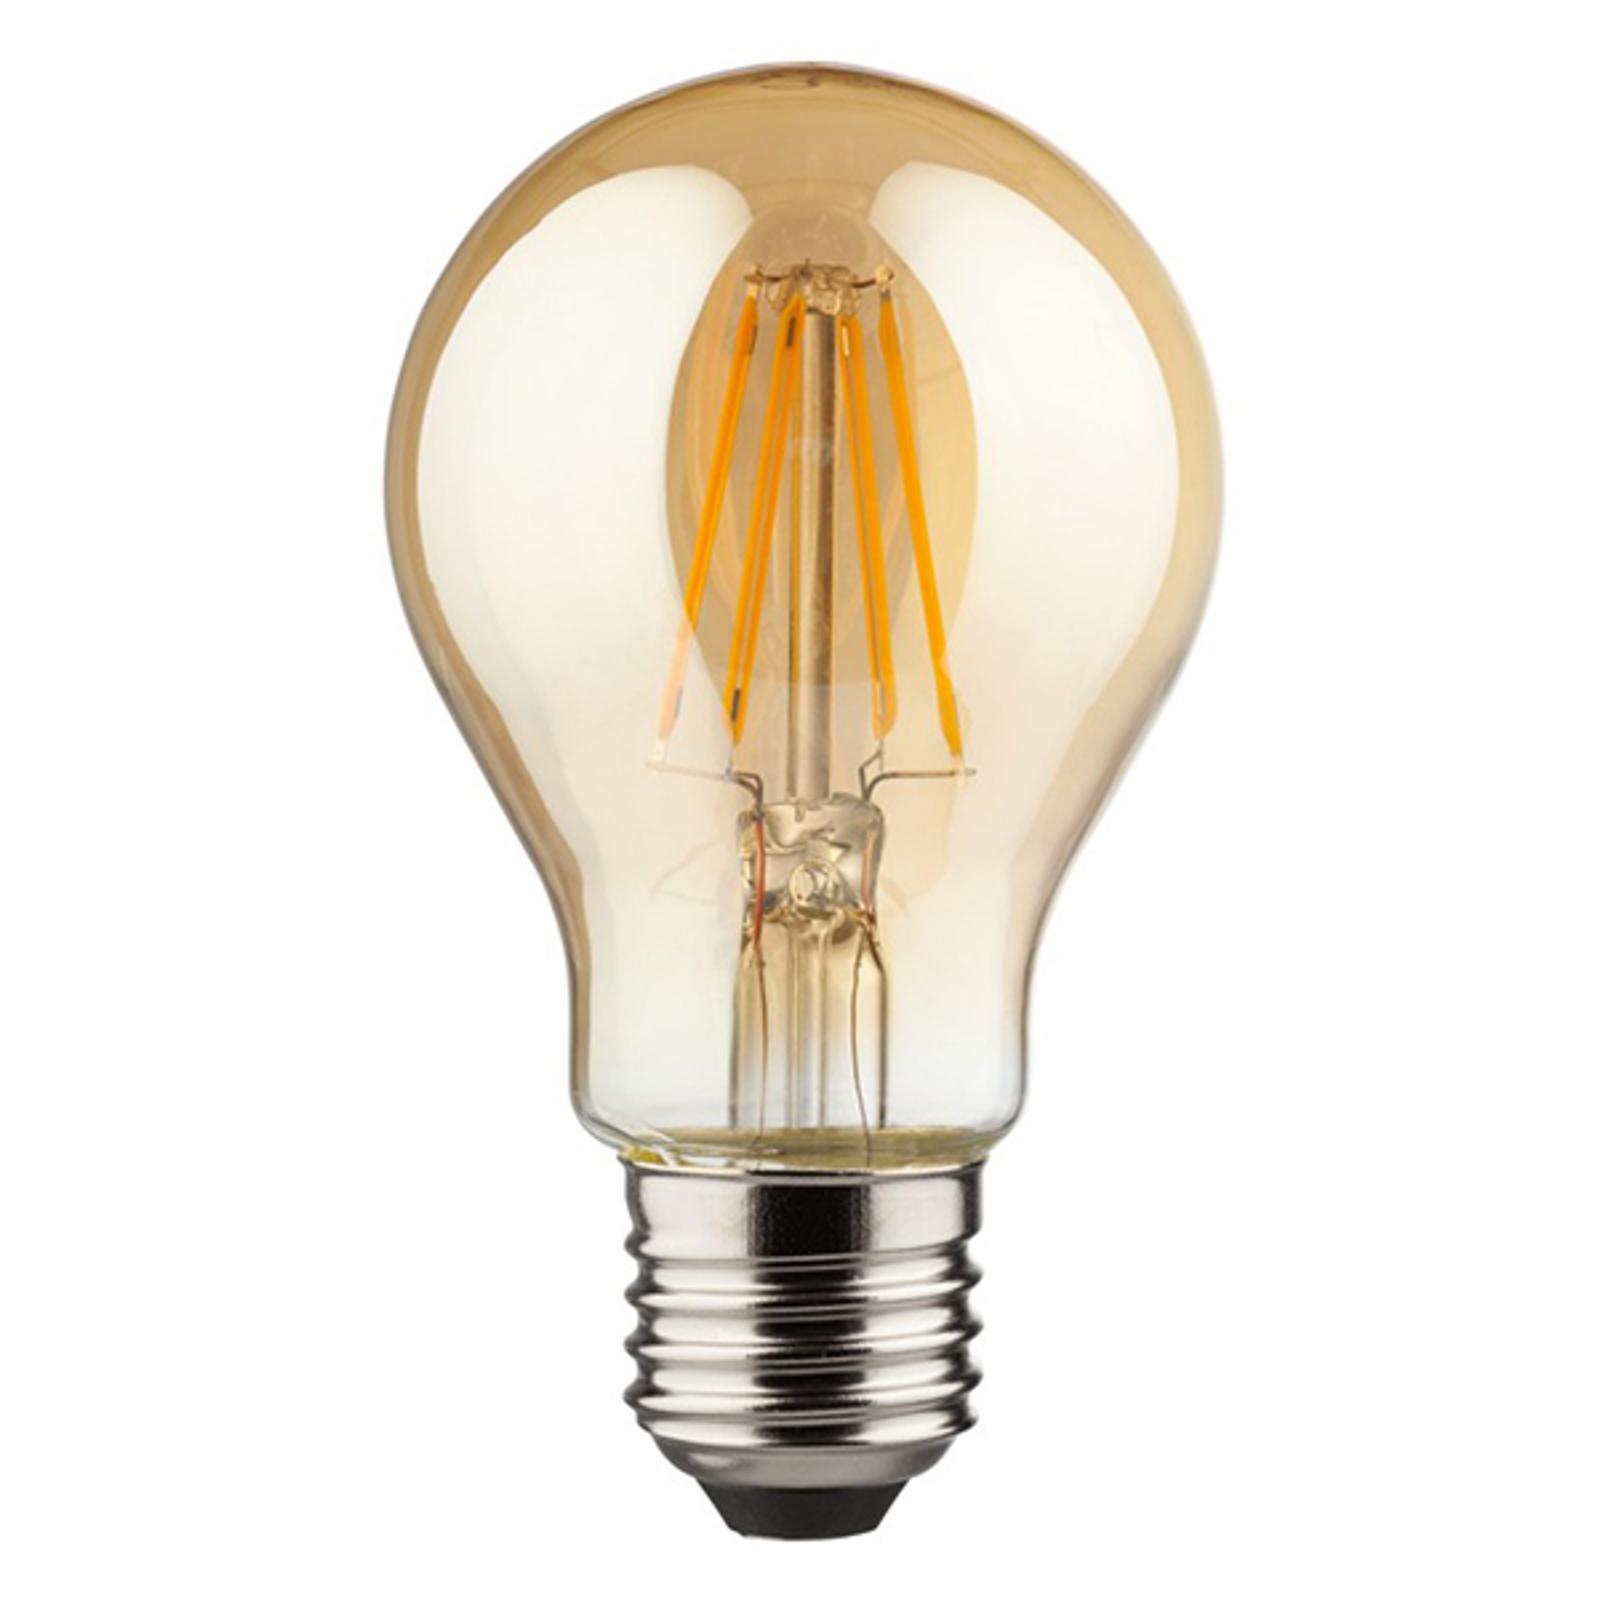 E27 4W 820 LED-Filament-Lampe gold